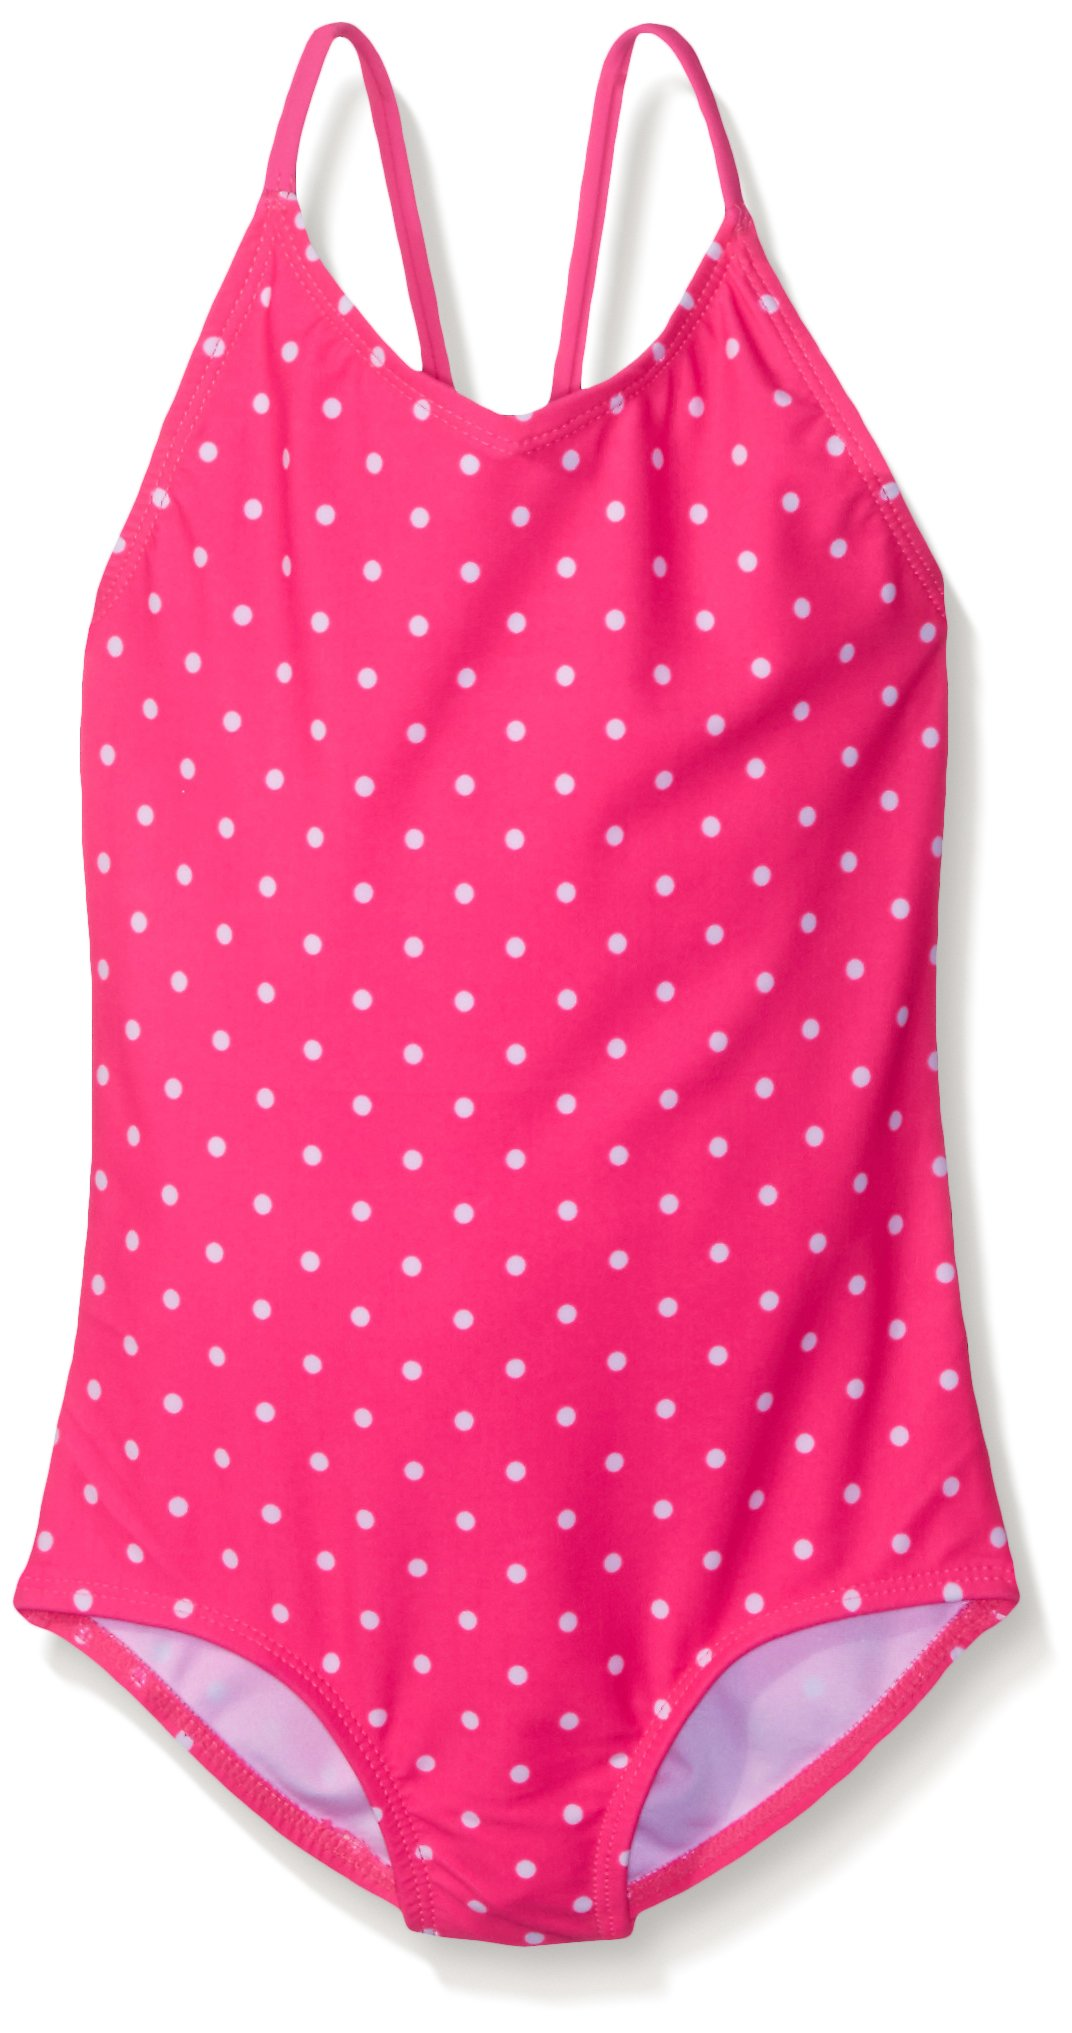 Kanu Surf Big Girls Chloe One Piece Swimsuit,Pink,12